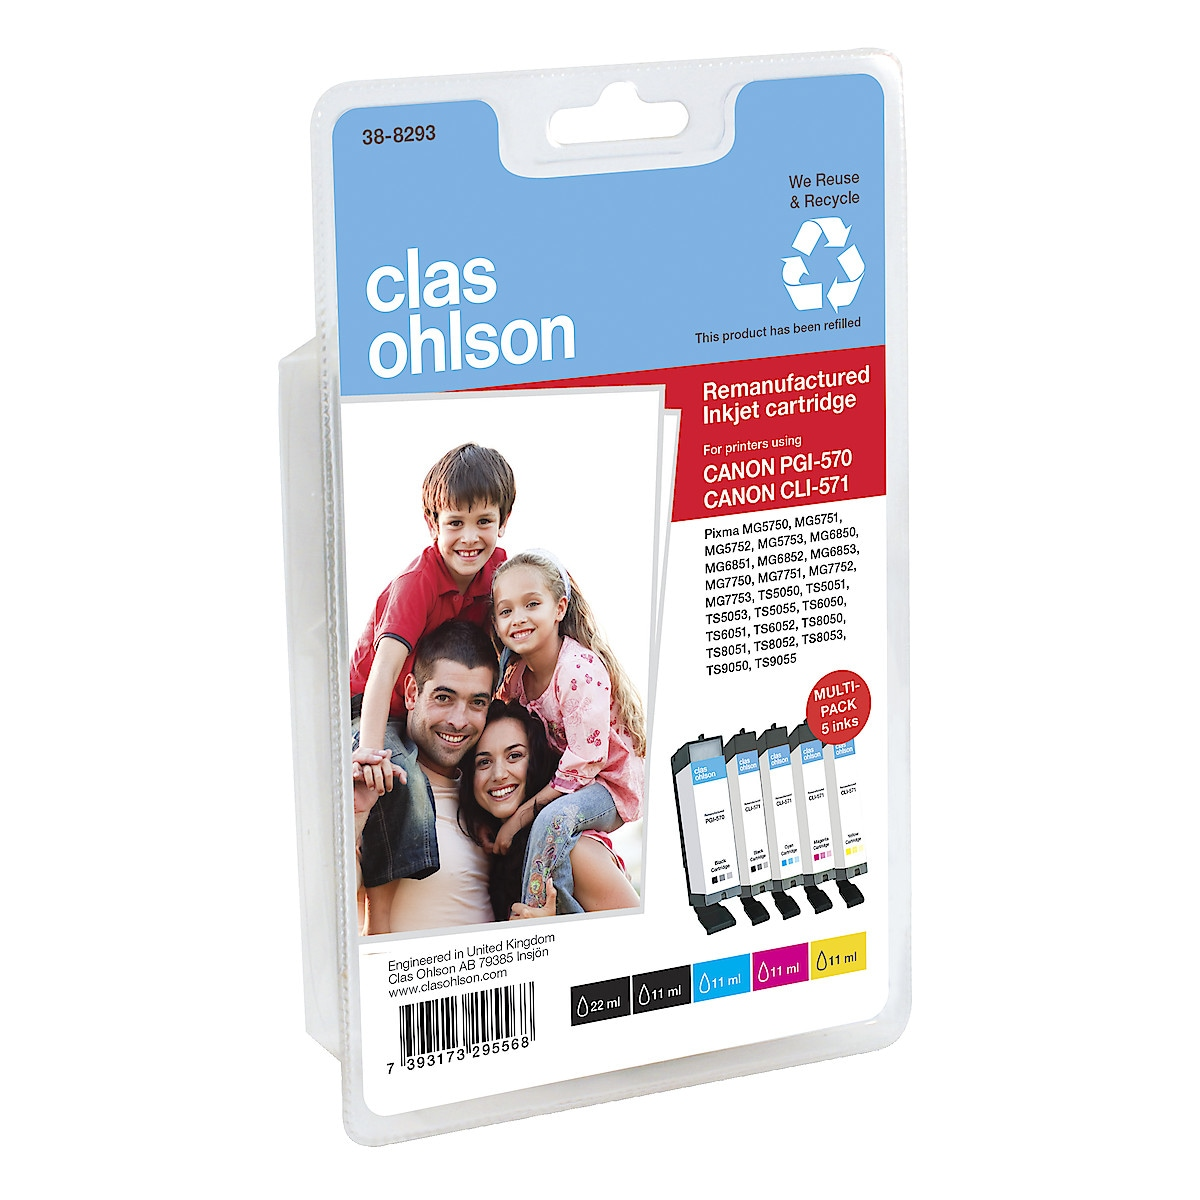 Clas Ohlson Canon PGI-570/CLI-571 Ink Cartridges